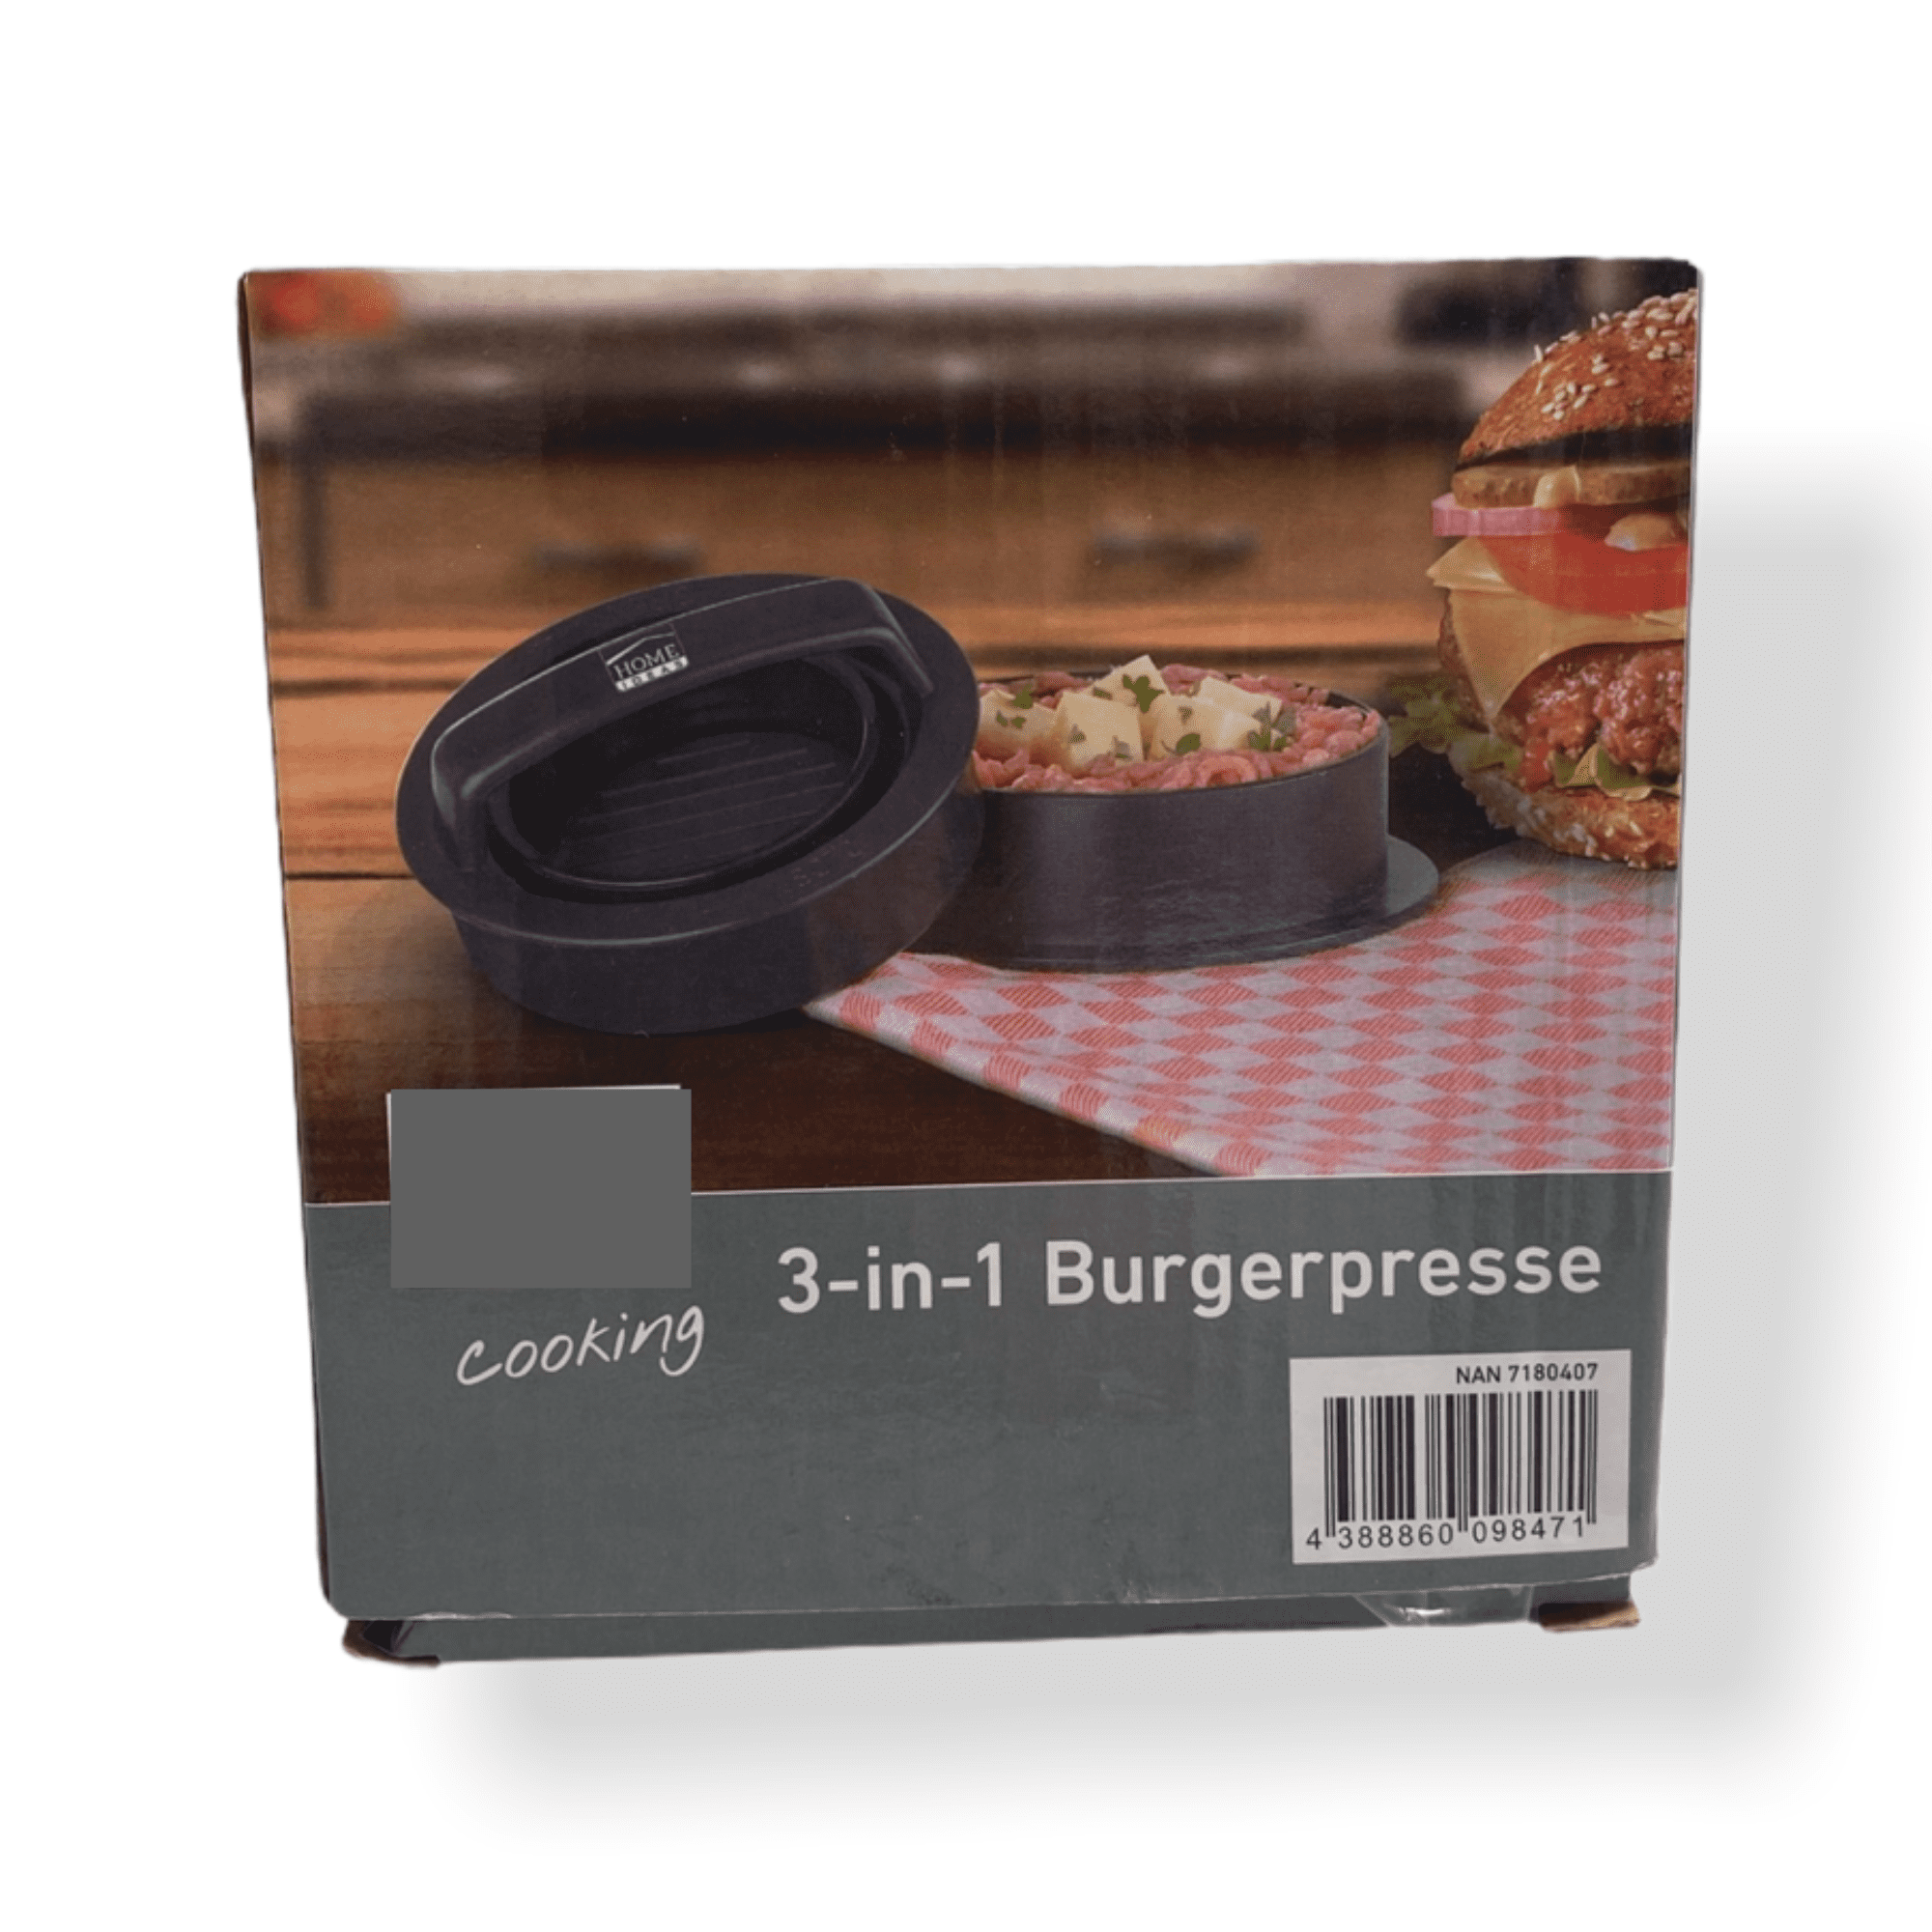 Burgerpresse 3in1